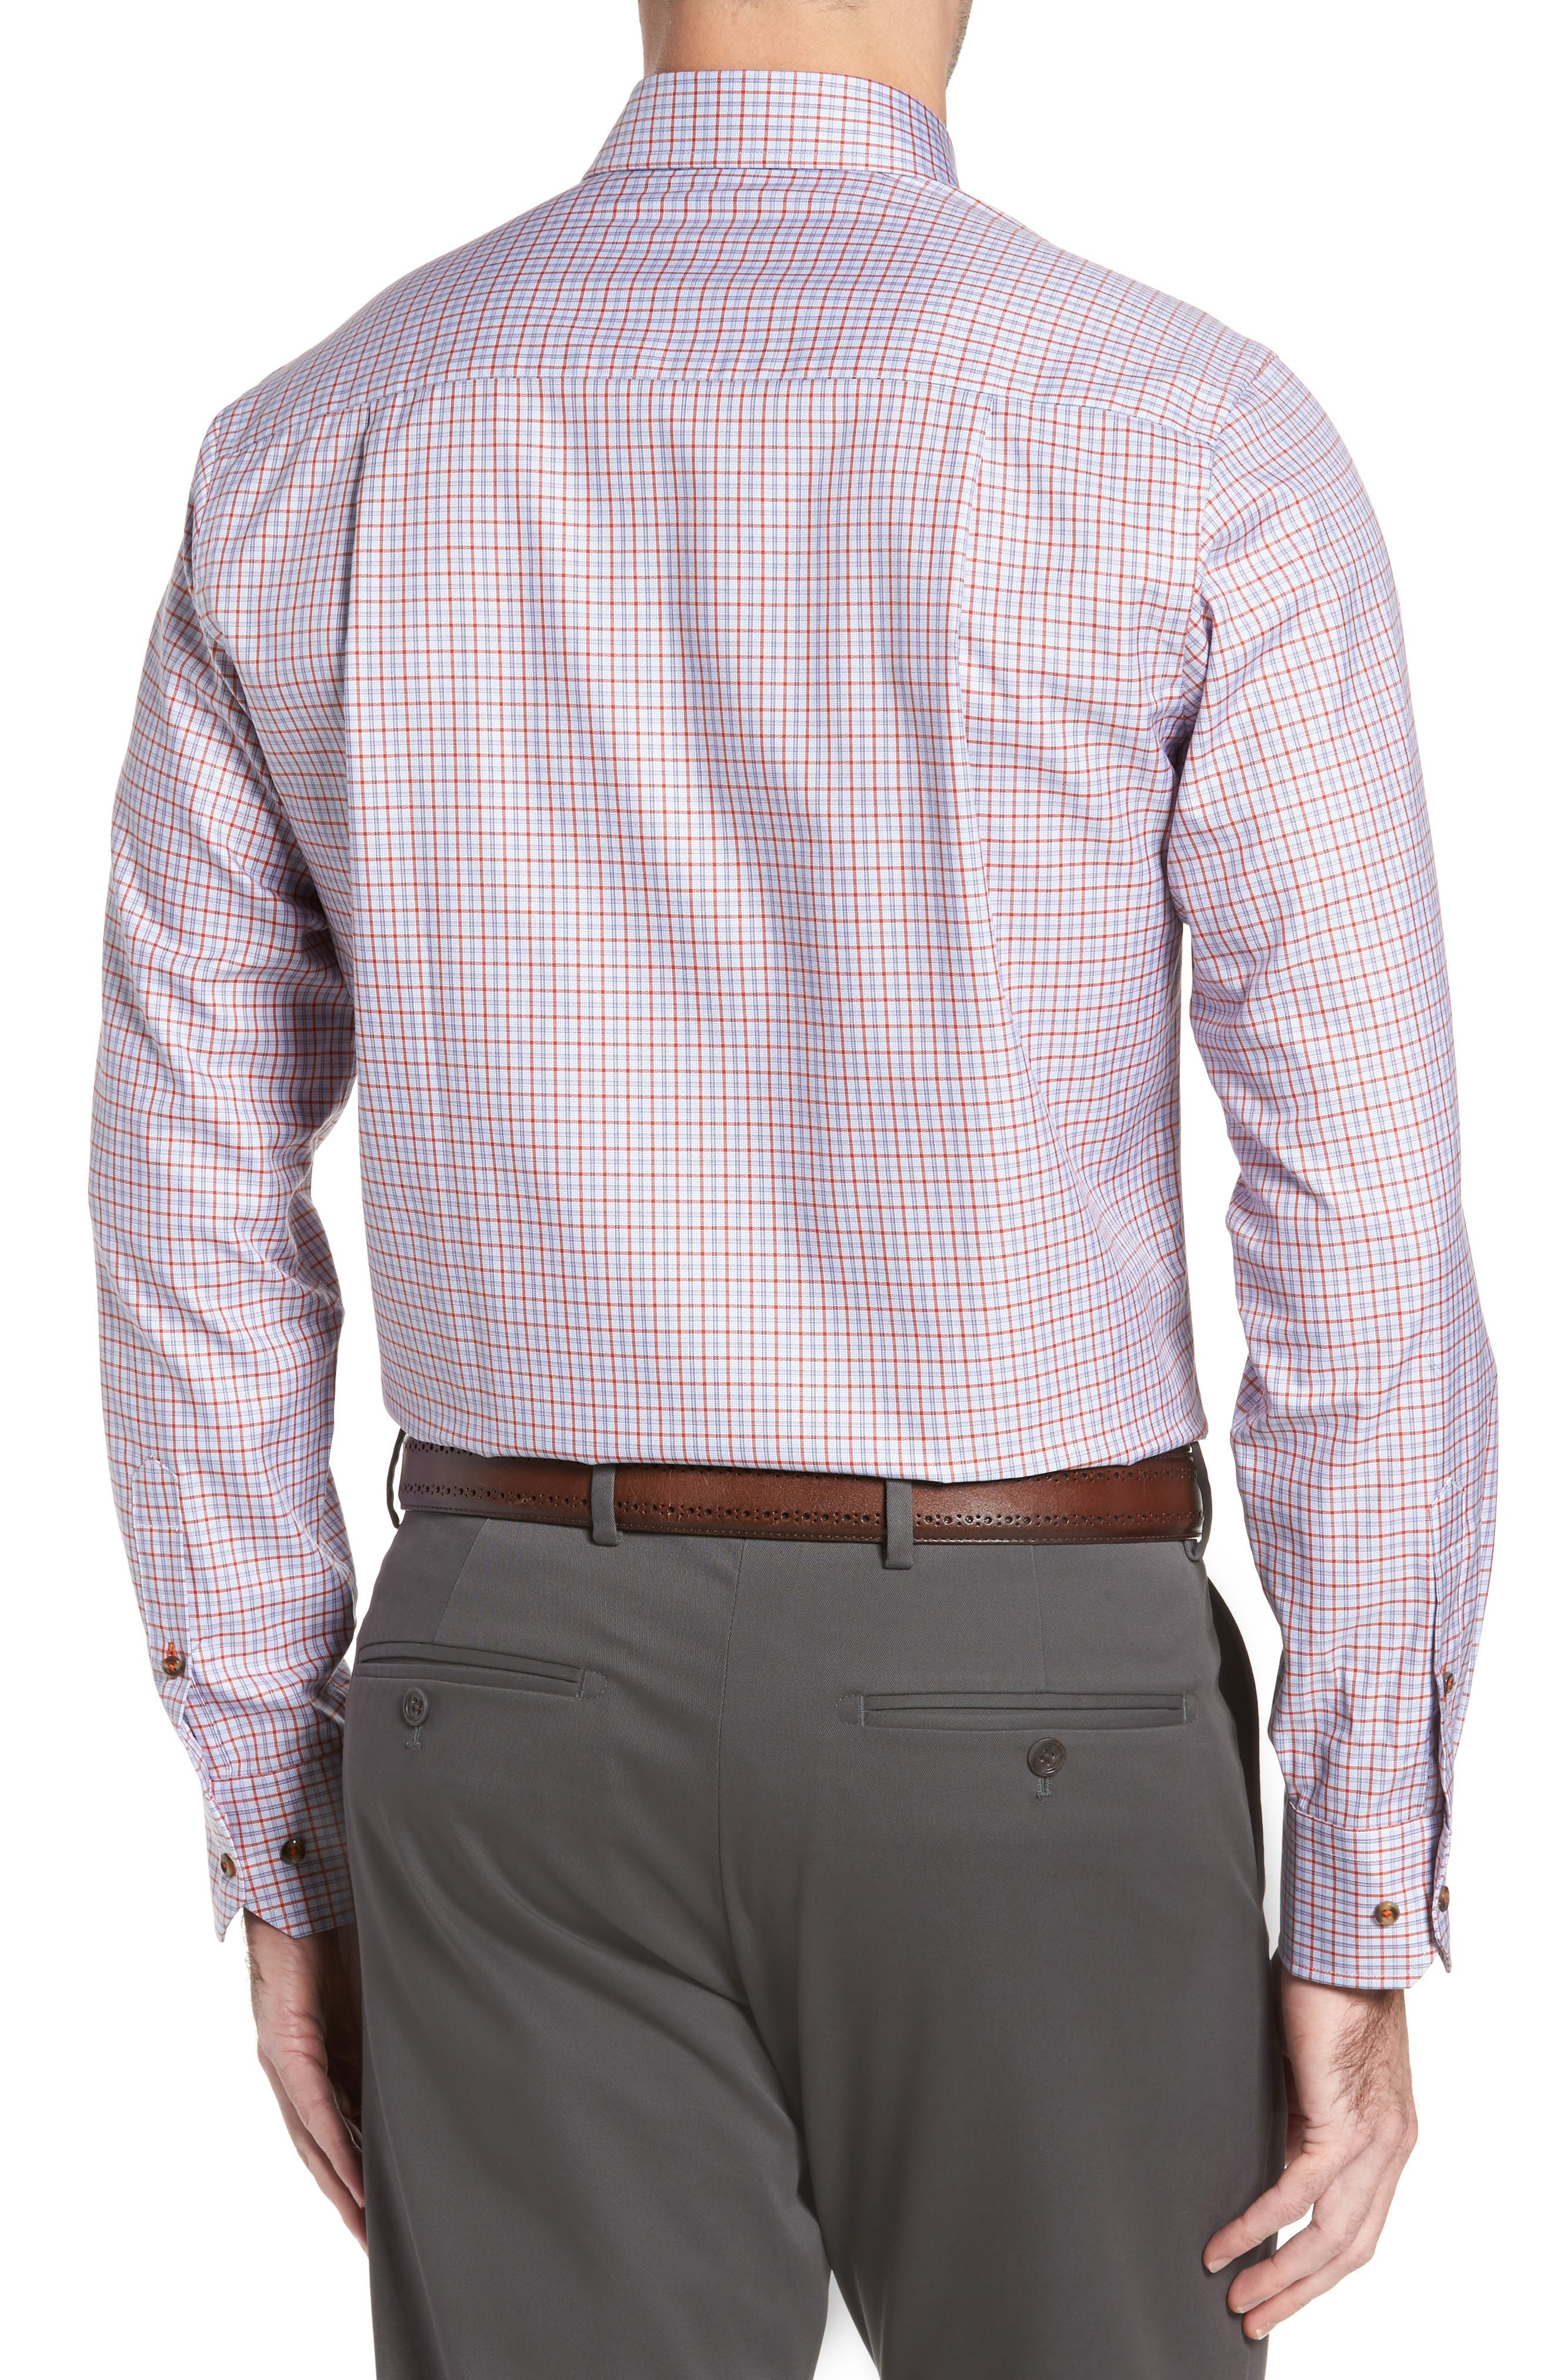 Regular Fit Plaid Sport Shirt,                             Alternate thumbnail 2, color,                             804